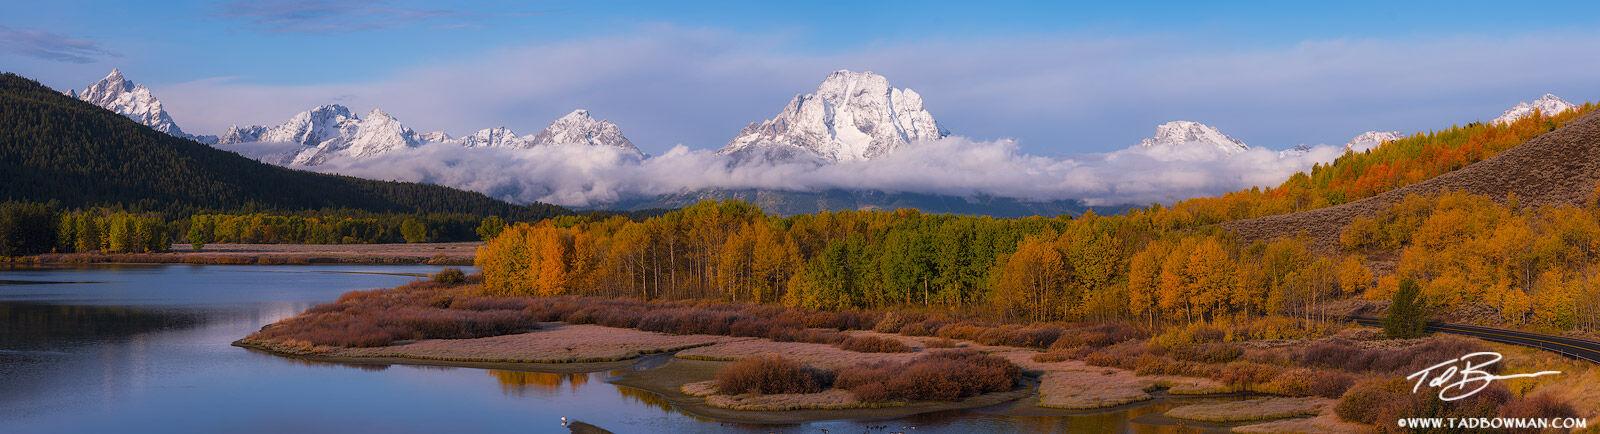 Wyoming, Grand Tetons, Grand Teton photos, Grand Teton fall photos, fall, autumn, fall foliage, Oxbow Bend, sunrise, snow, snowy, Grand Tetons snow, photo